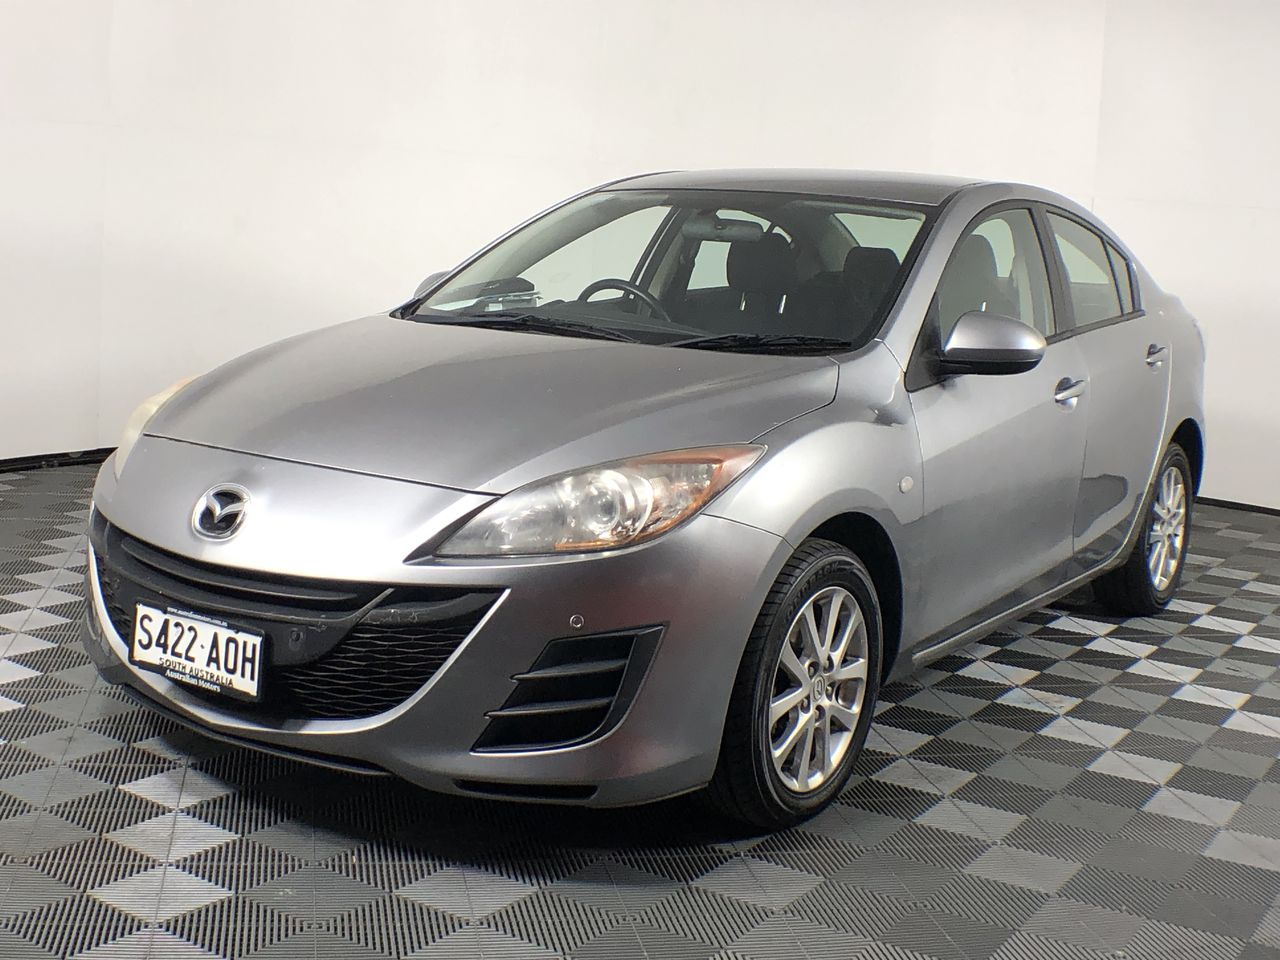 2010 Mazda 3 Neo BL Automatic Sedan (WOVR- INSPECTED)